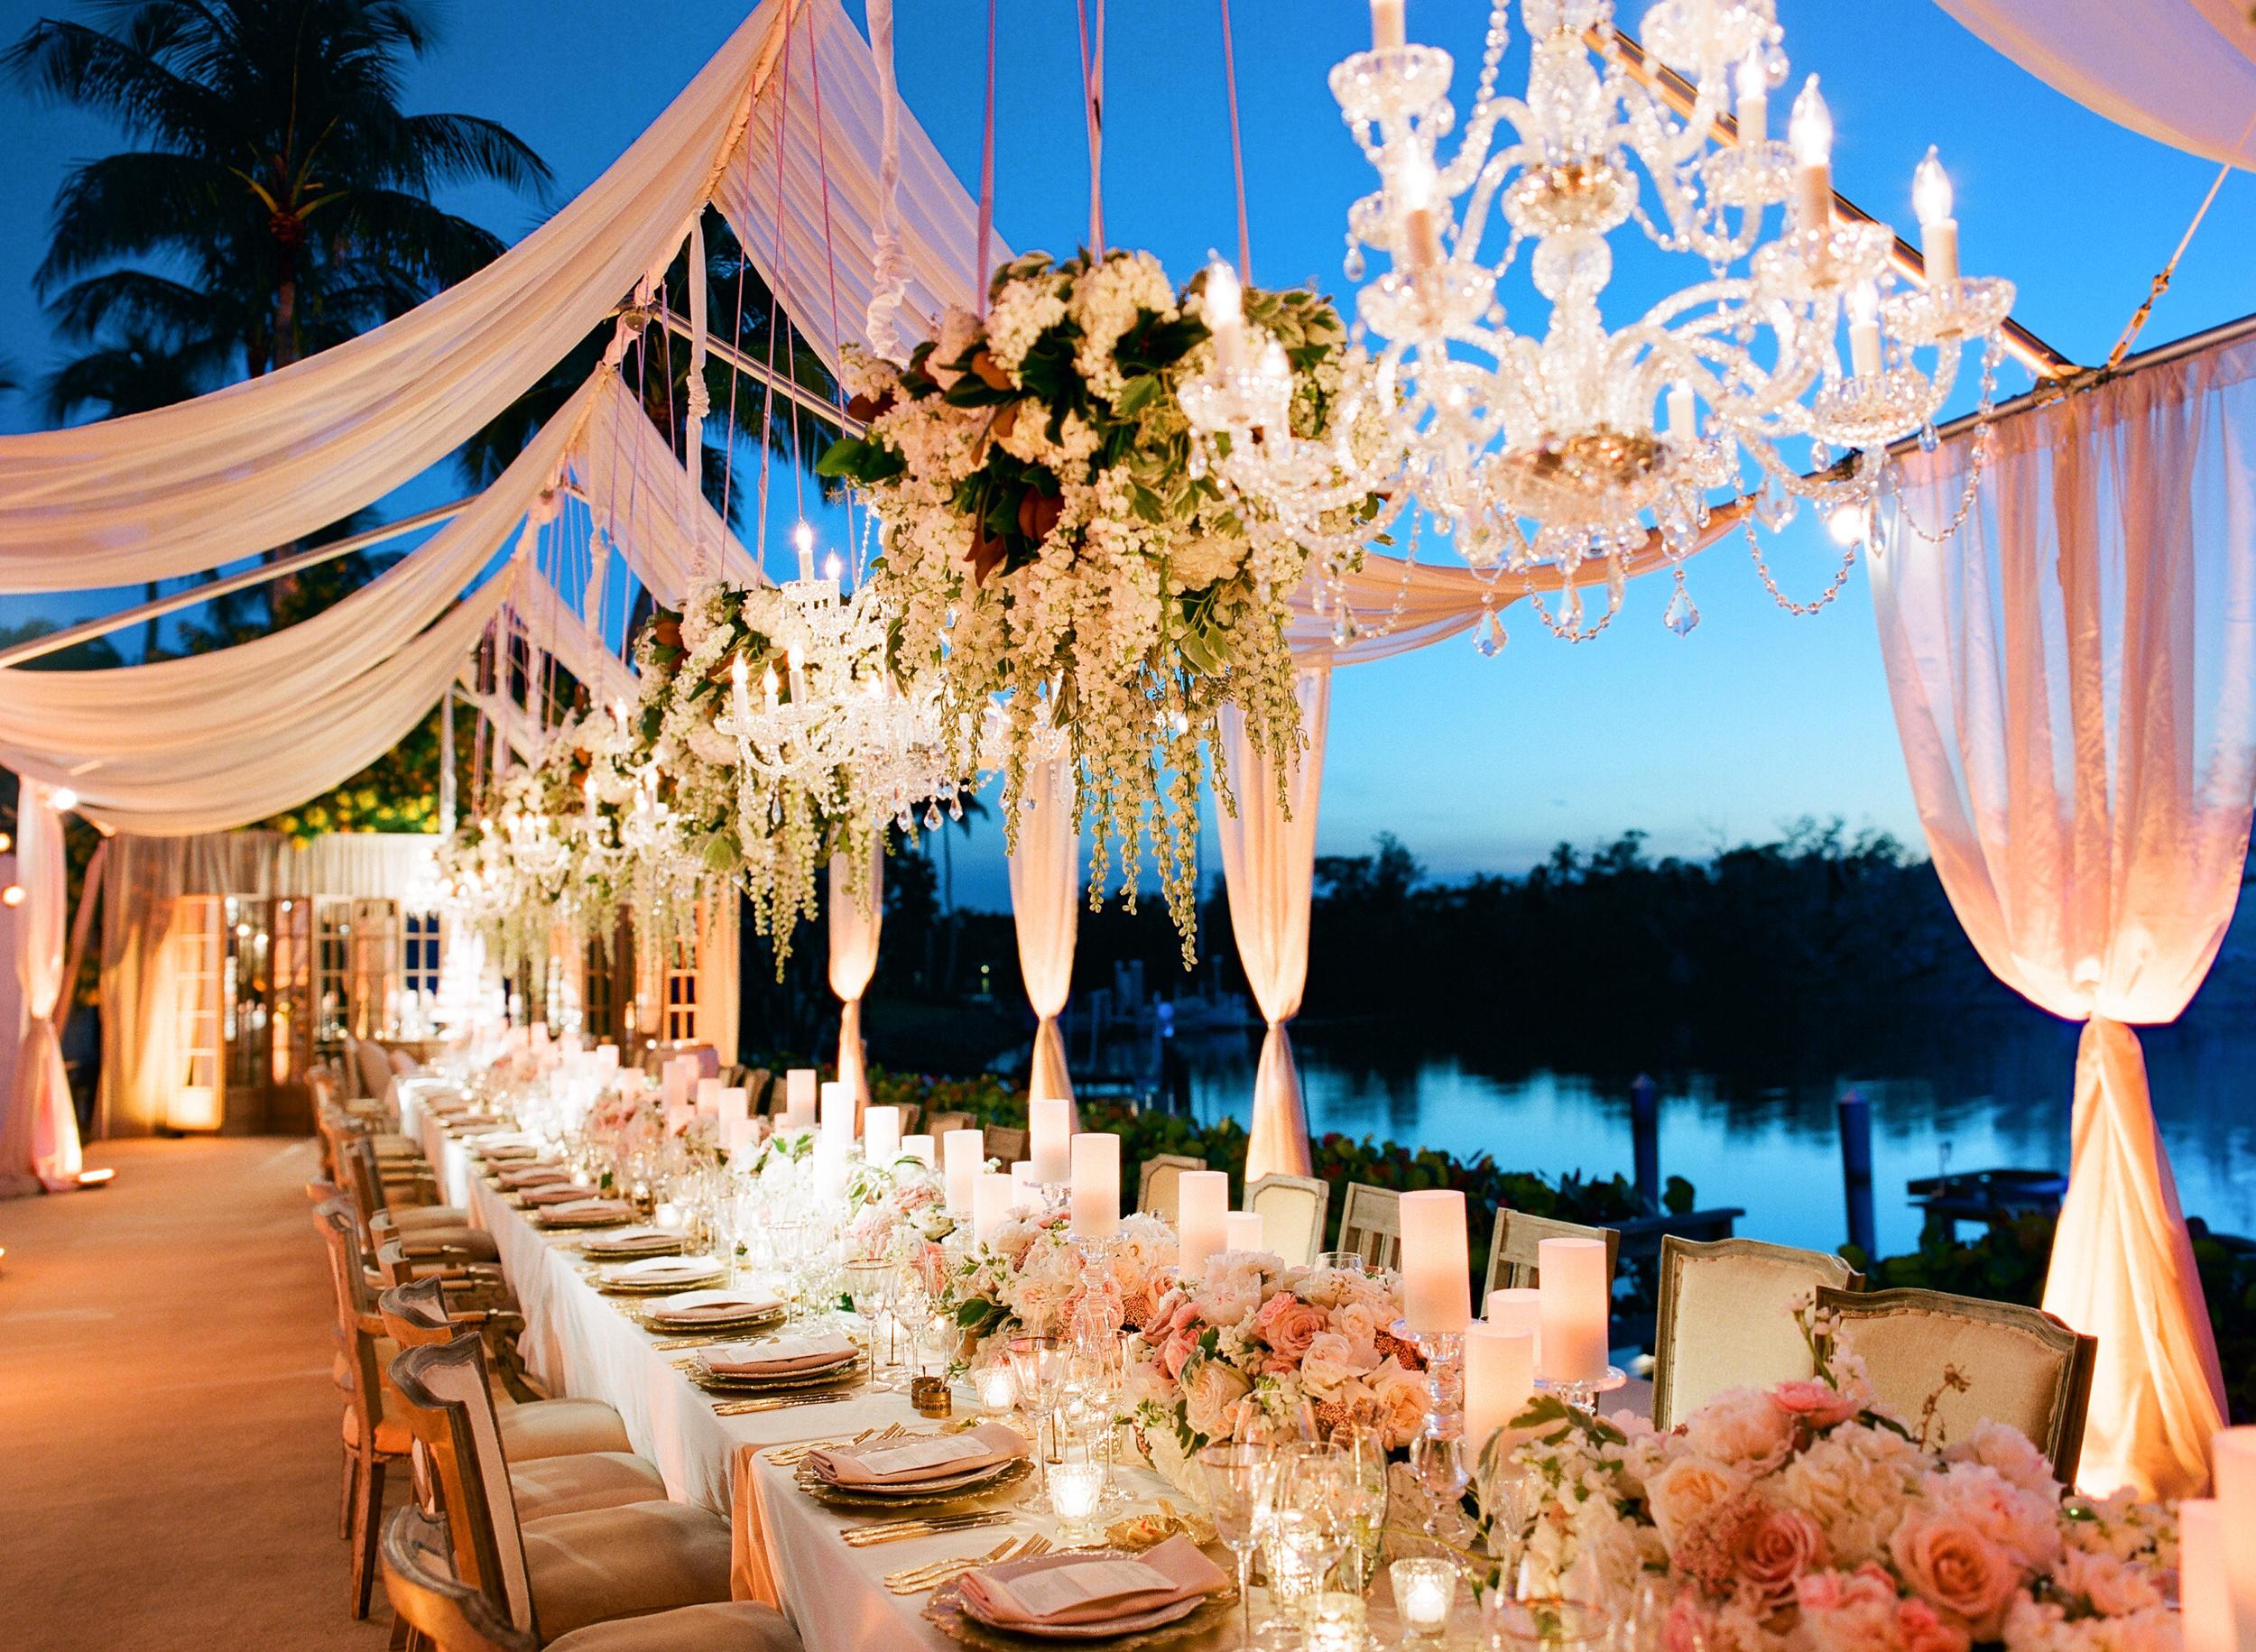 Ceci_New_York_Florida_Wedding_Style_Bride_Watercolor_Real_Custom_Luxury_132.jpg